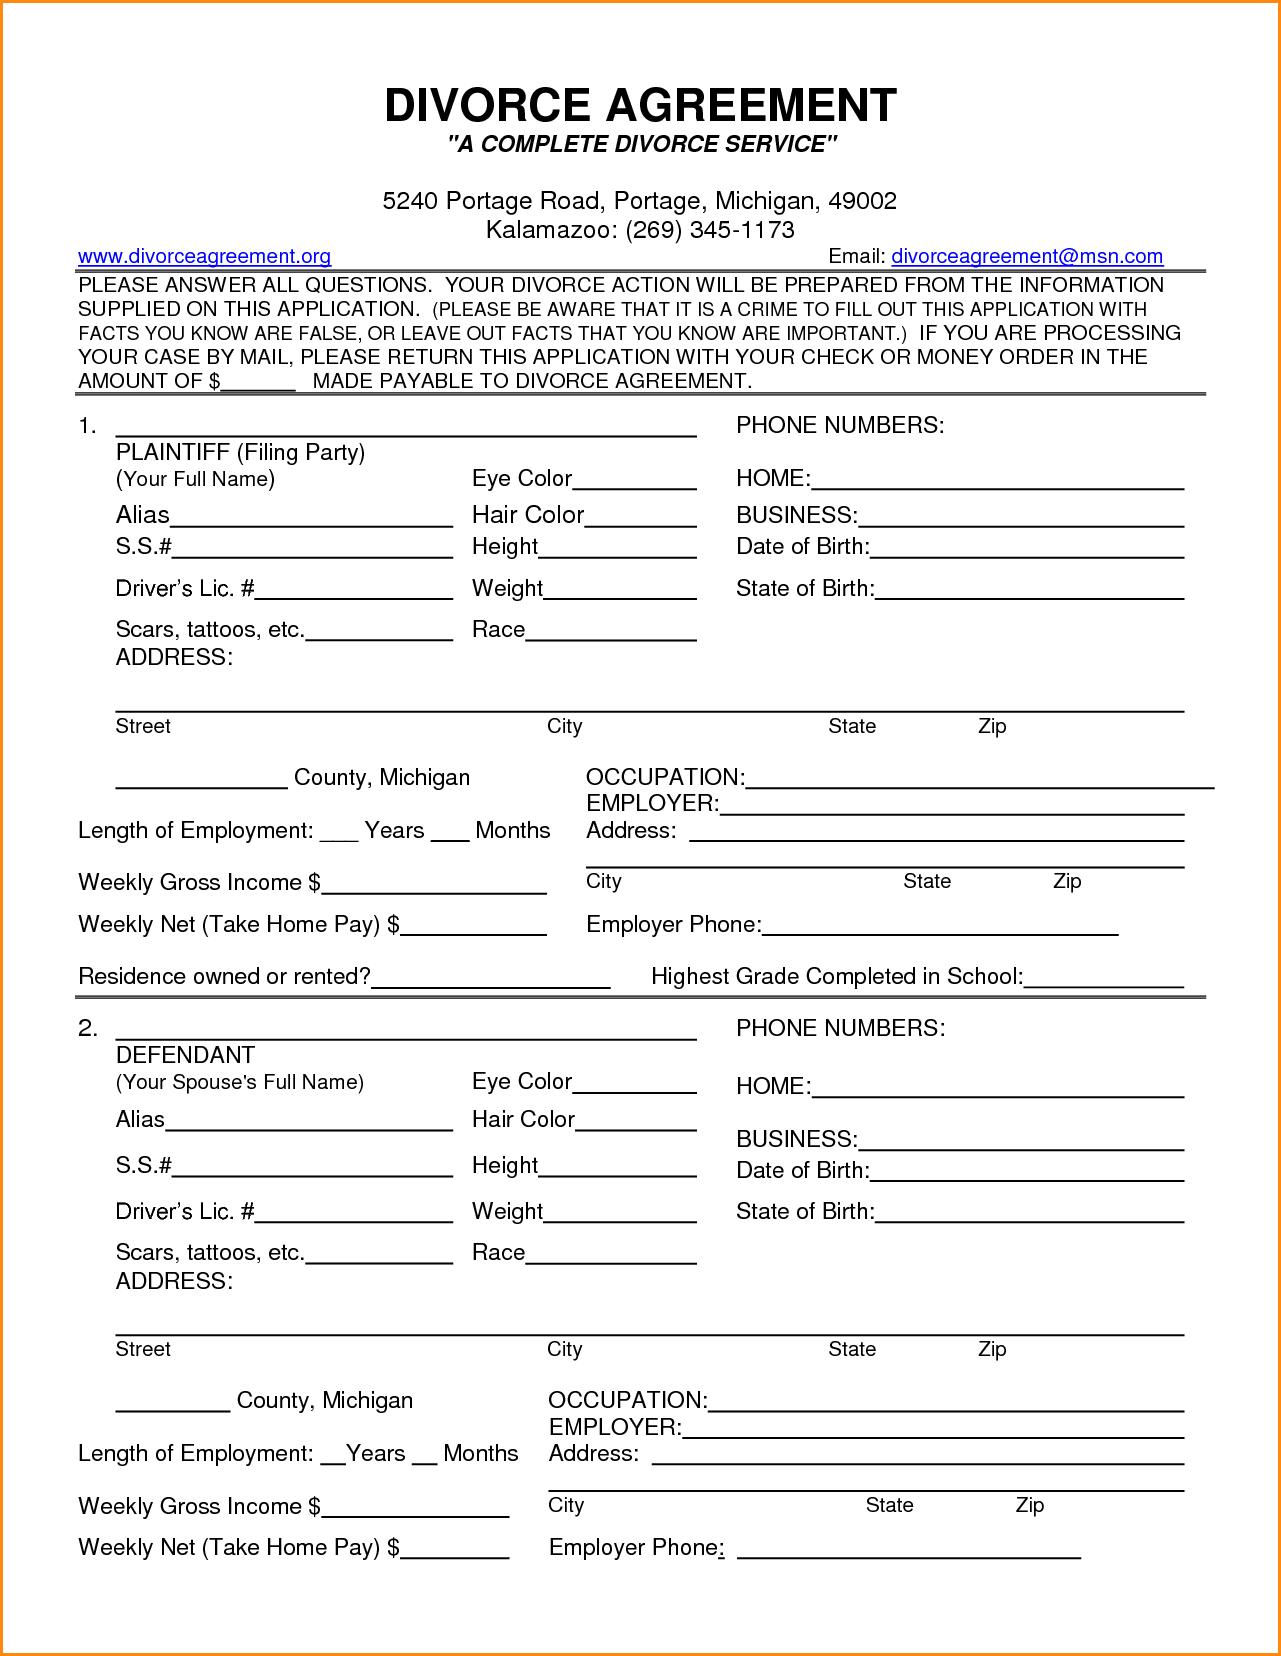 Free Legal Forms Virginia Divorce Sample Service Resume Findforms - Free Printable Divorce Forms Texas